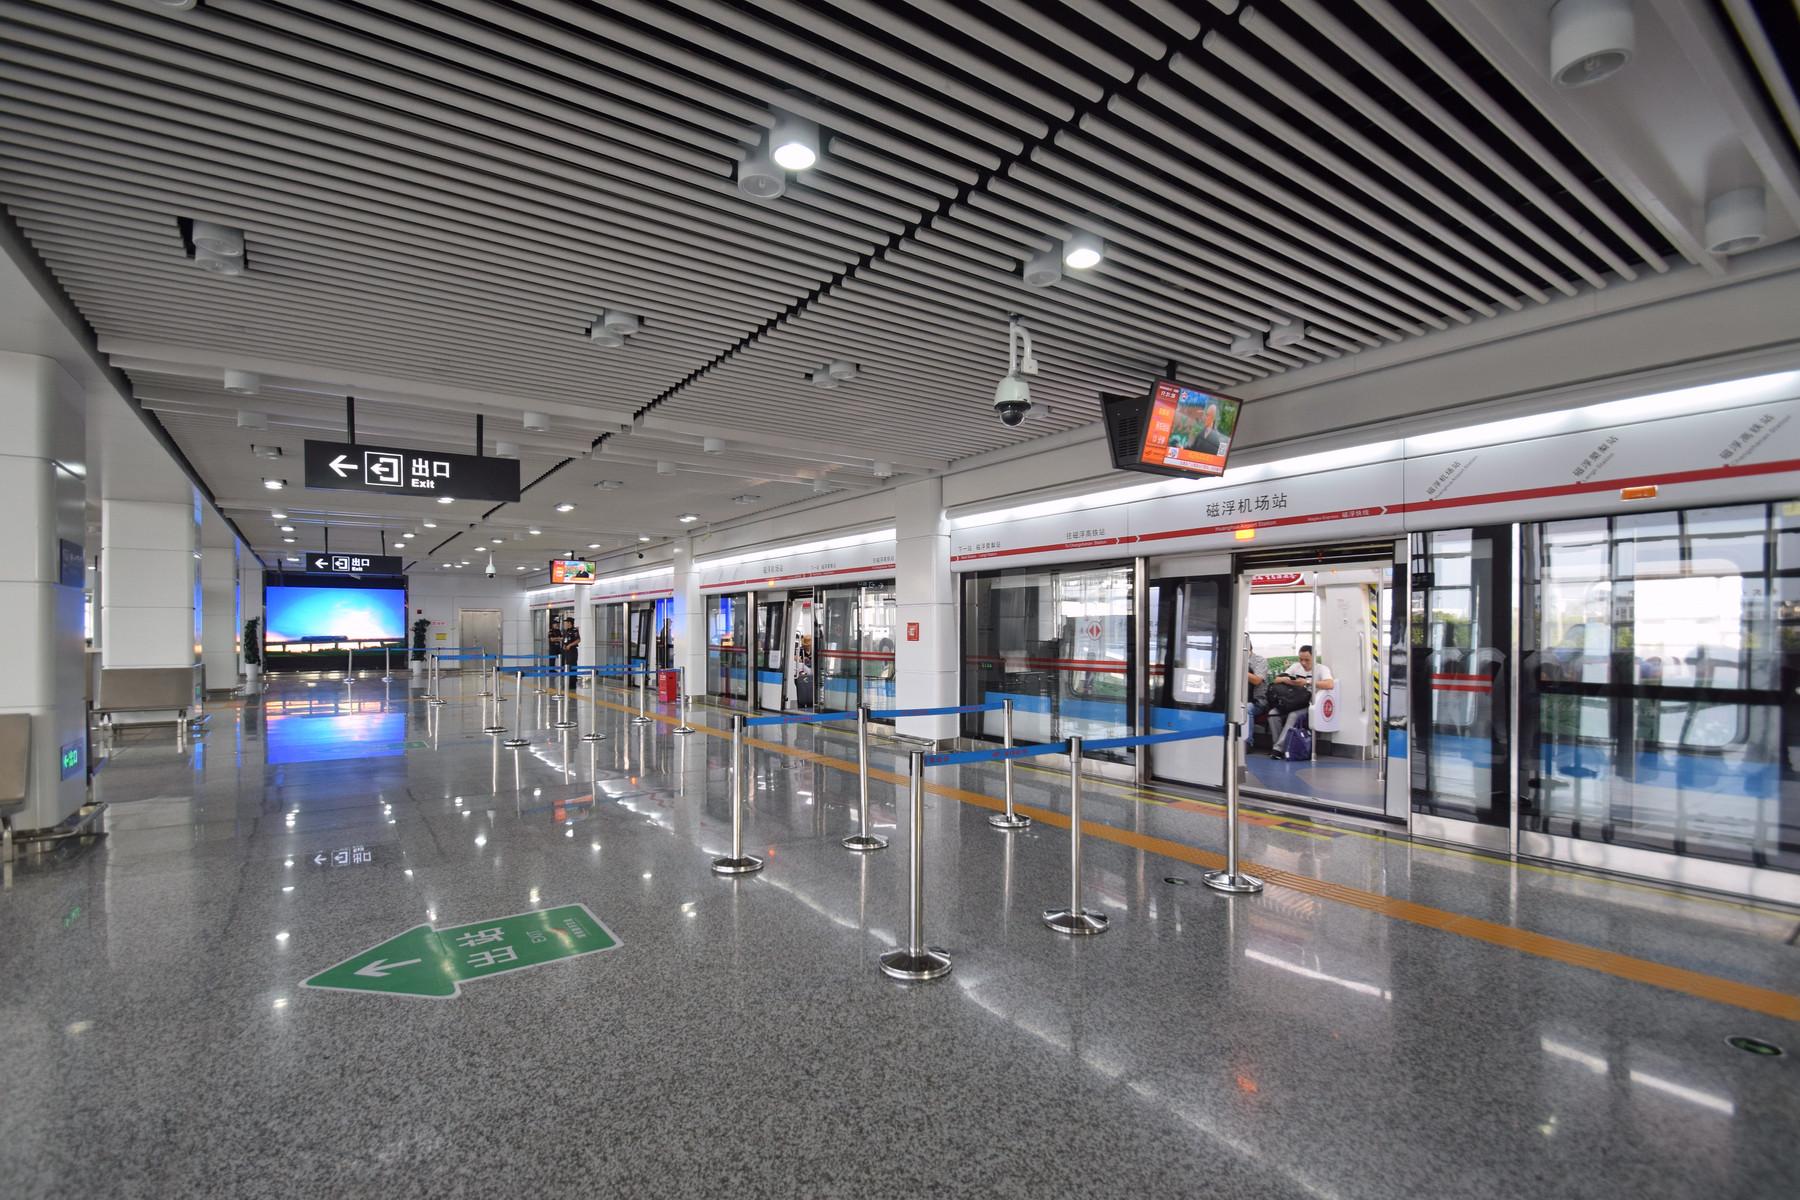 Changsha Maglev Express station